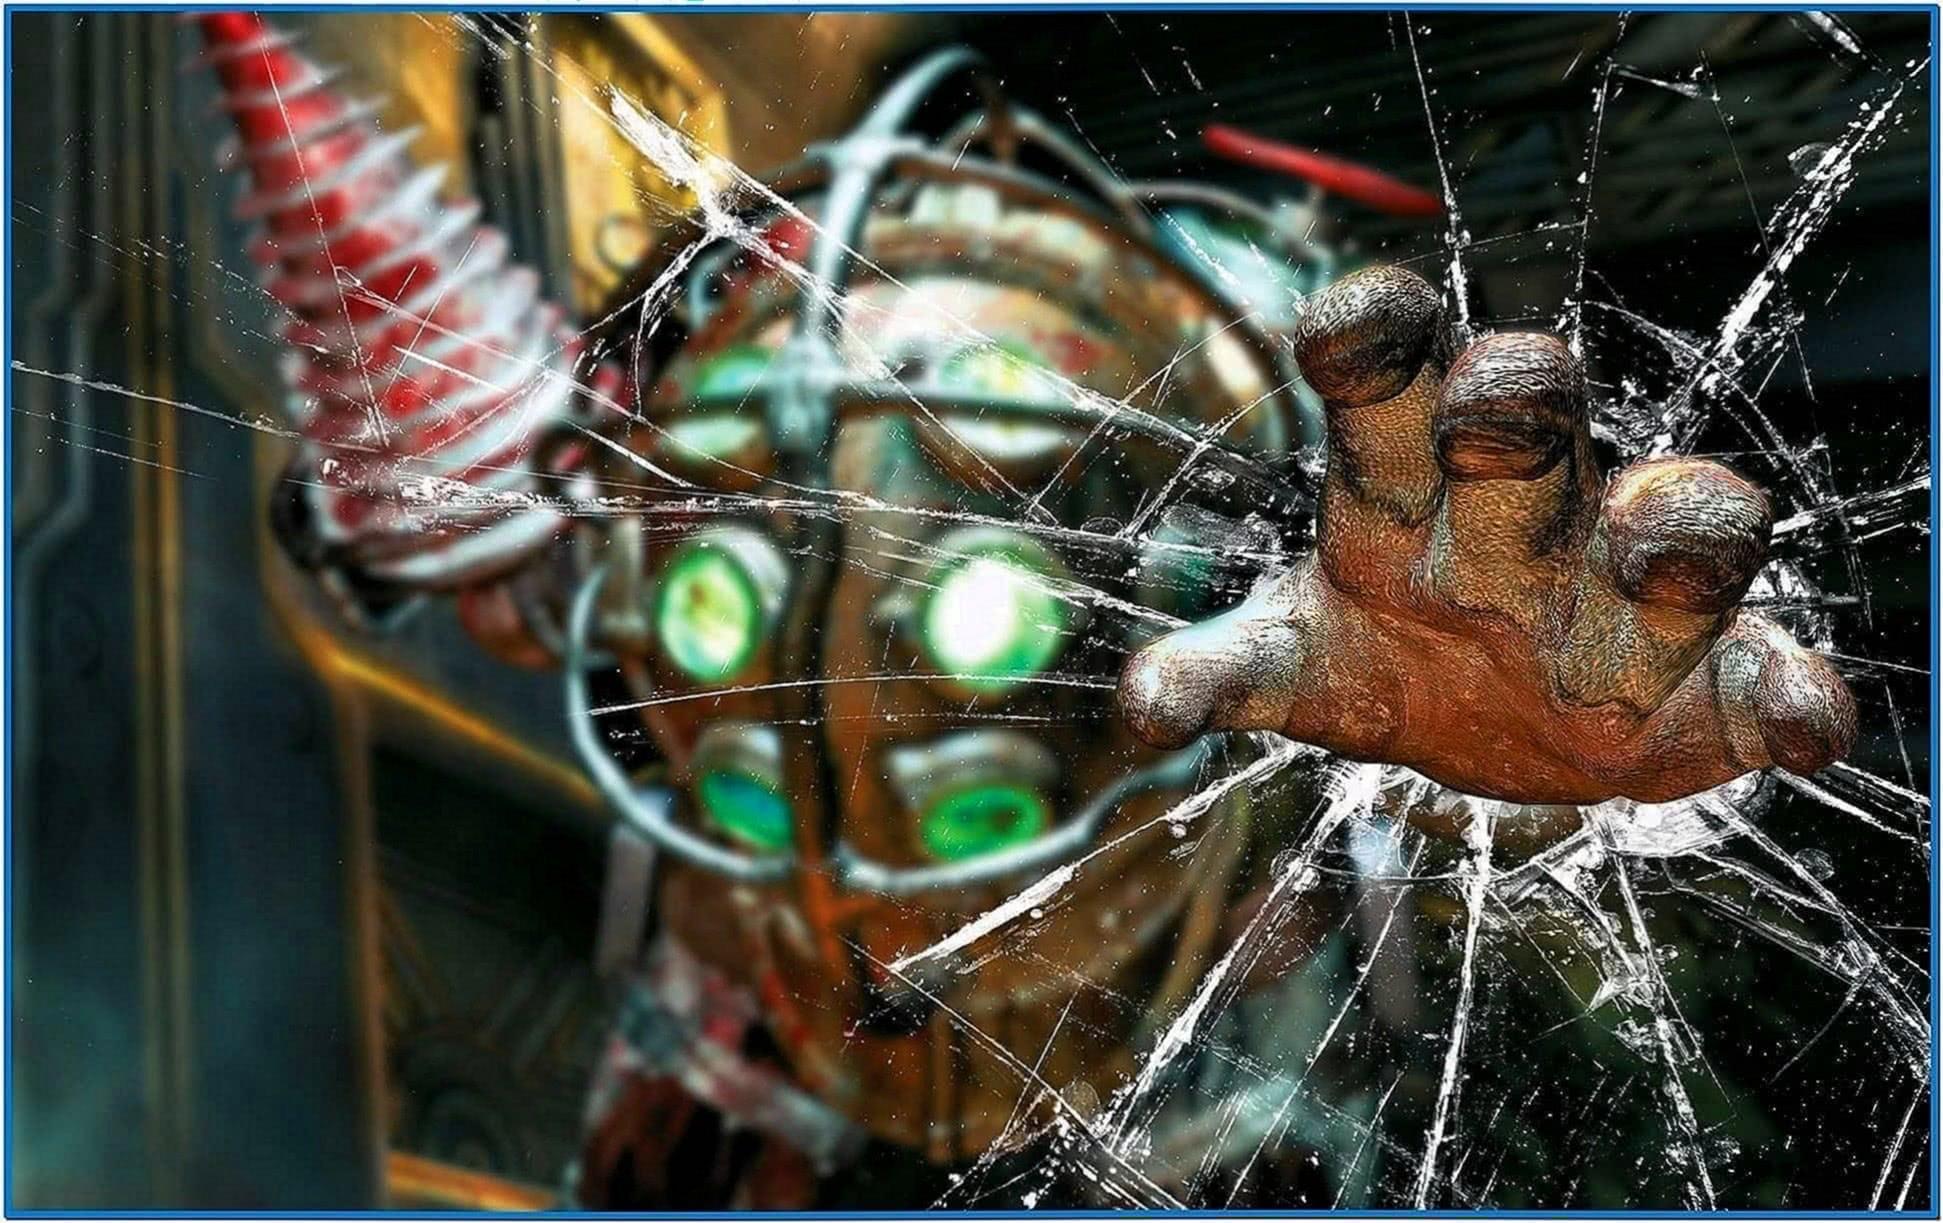 Animated Bioshock Screensaver